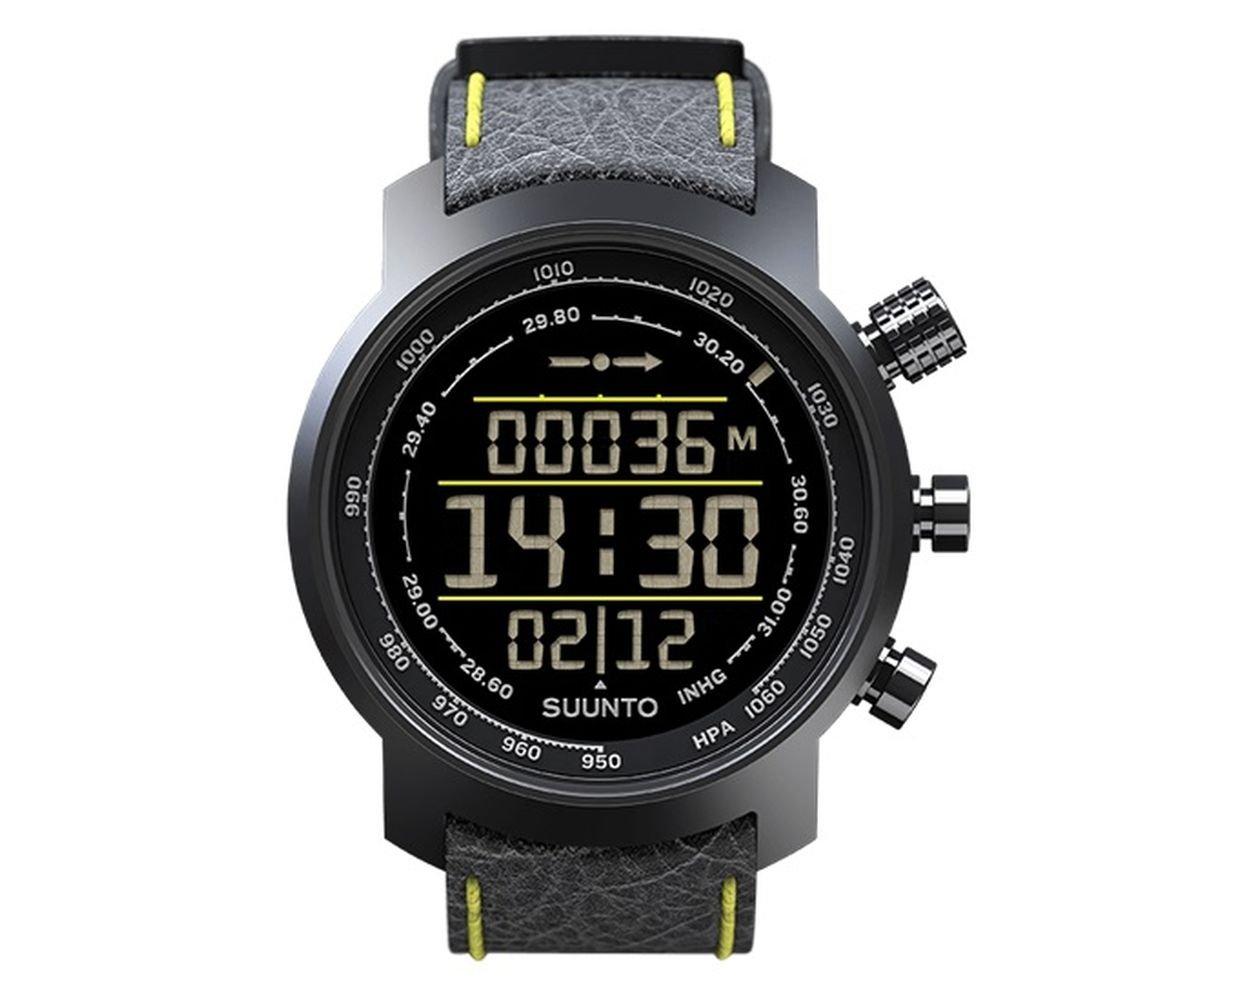 Suunto Elementum Terra Black/Yellow Leather Digital Display Quartz Watch, Black Leather Band, Round 51.5mm Case by Suunto